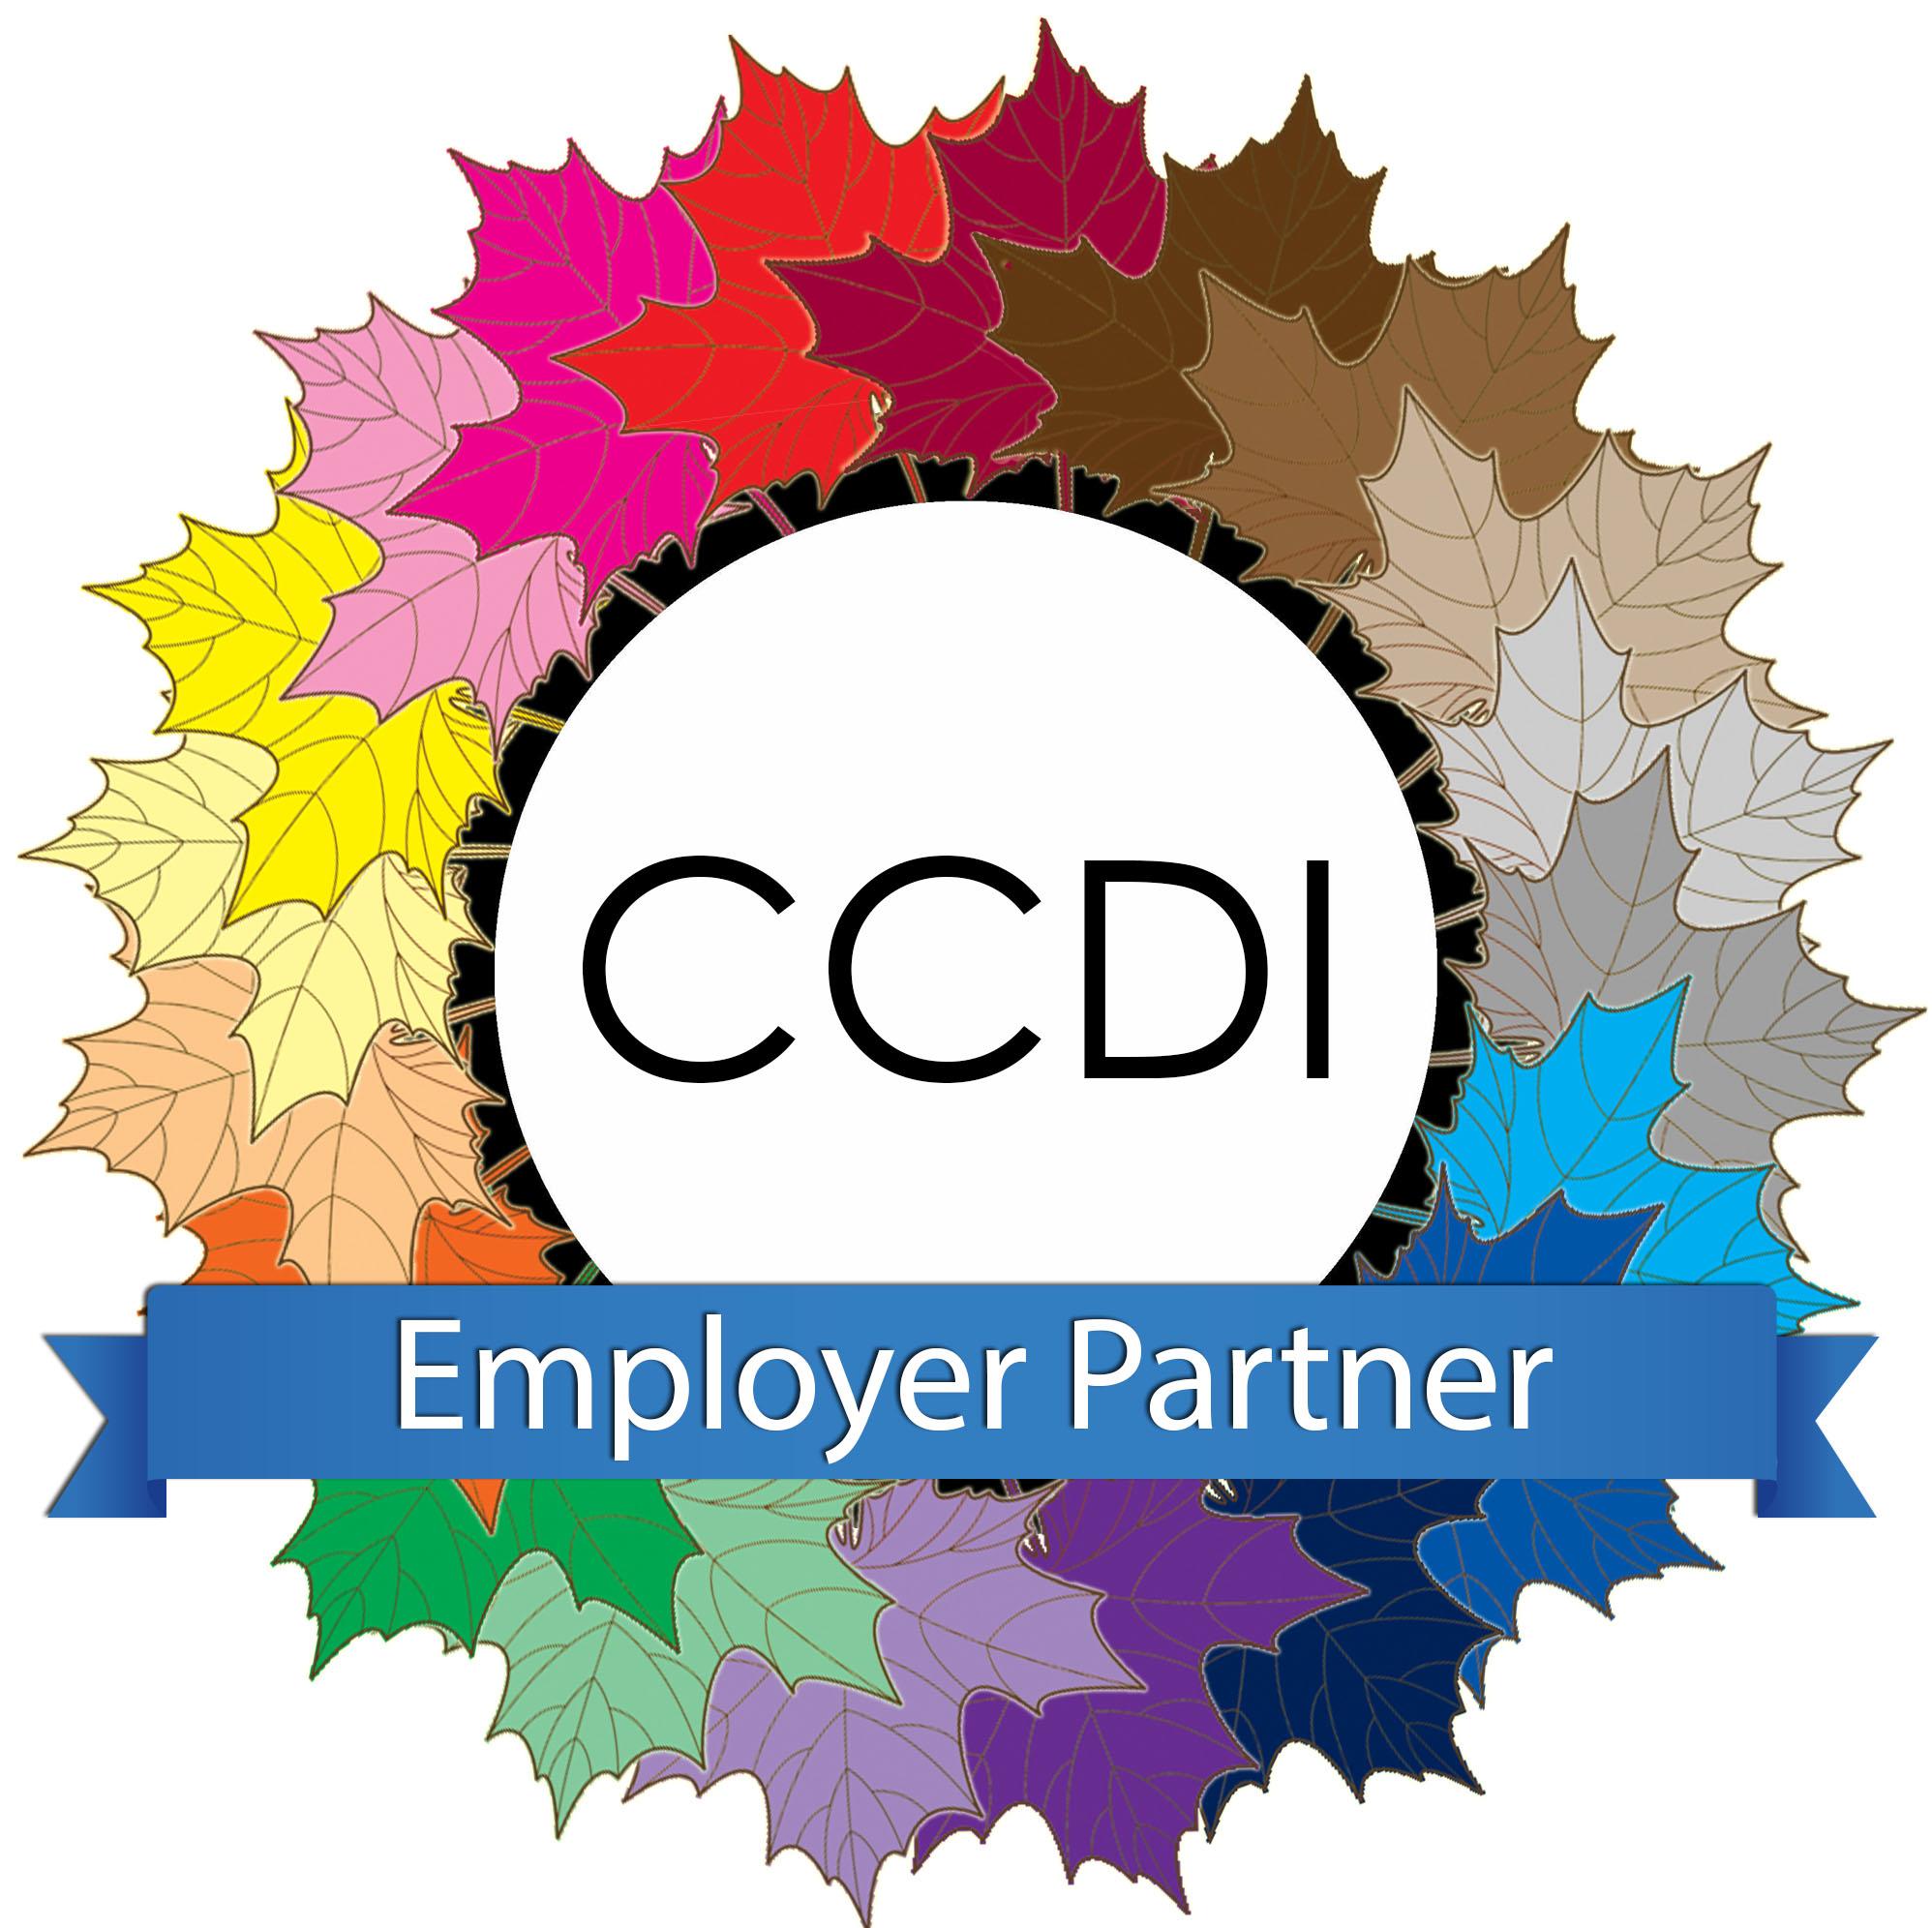 20151013 - CCDI - Logo - Employer Partner